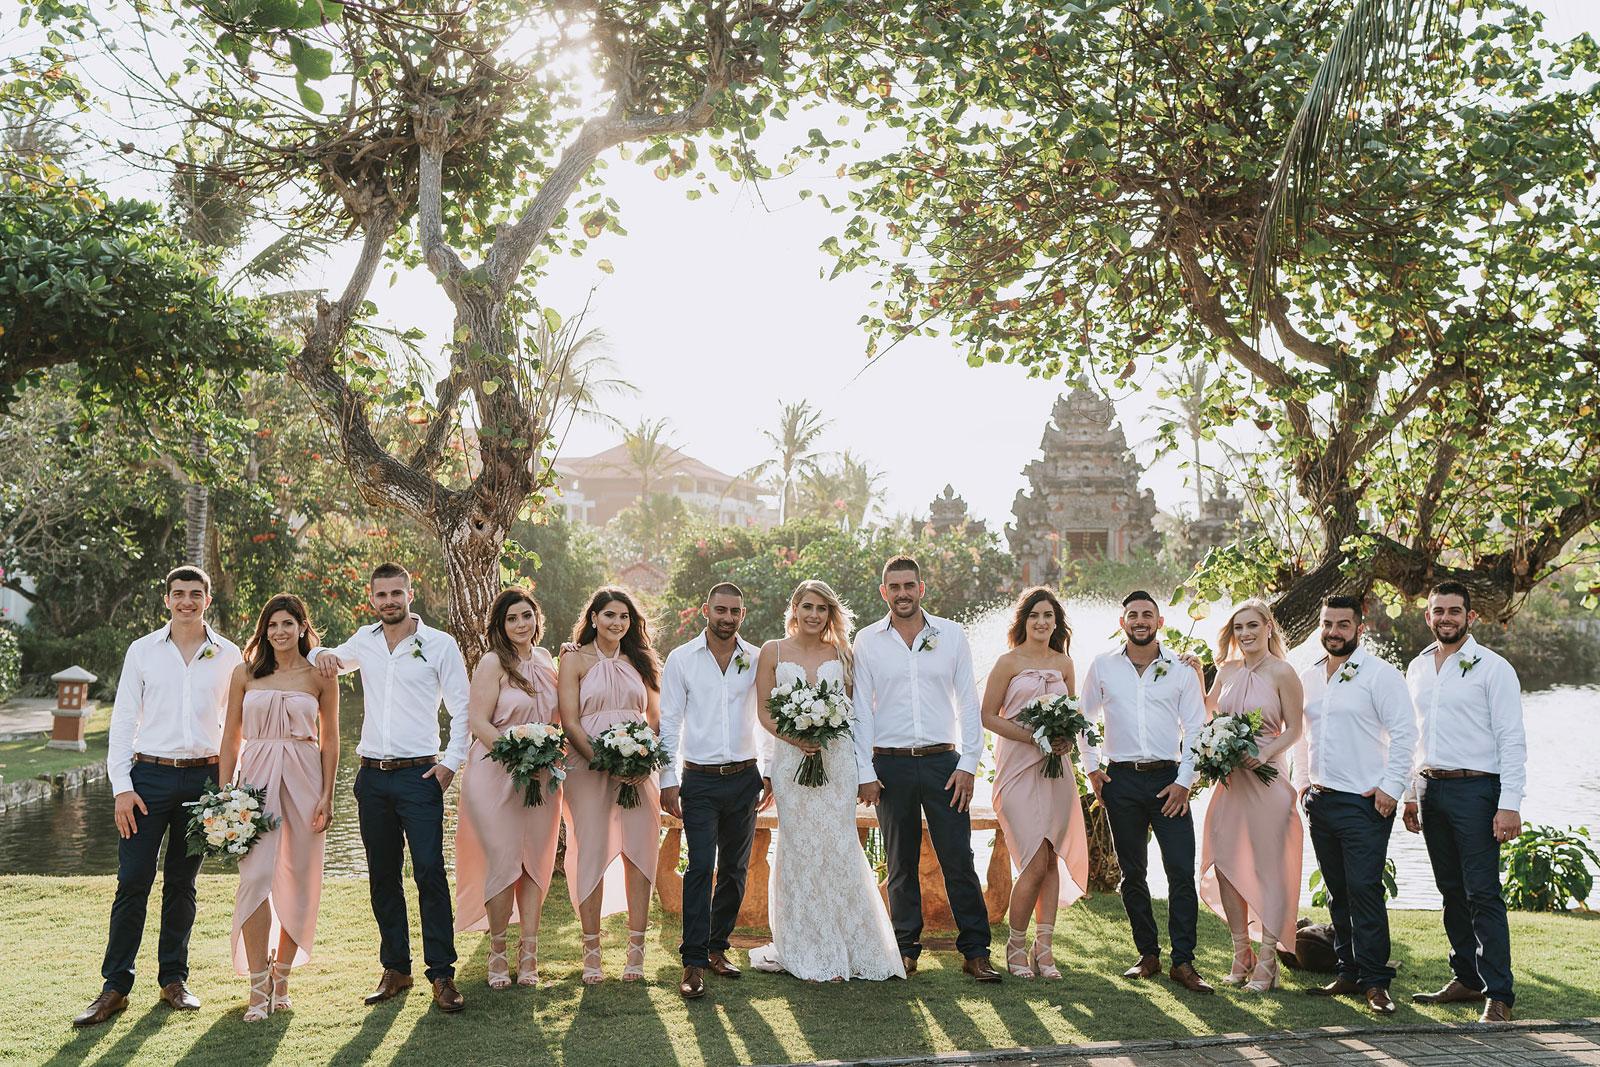 newfound-j-j-bali-nusa-dua-wedding-wedding-photographer-057-a